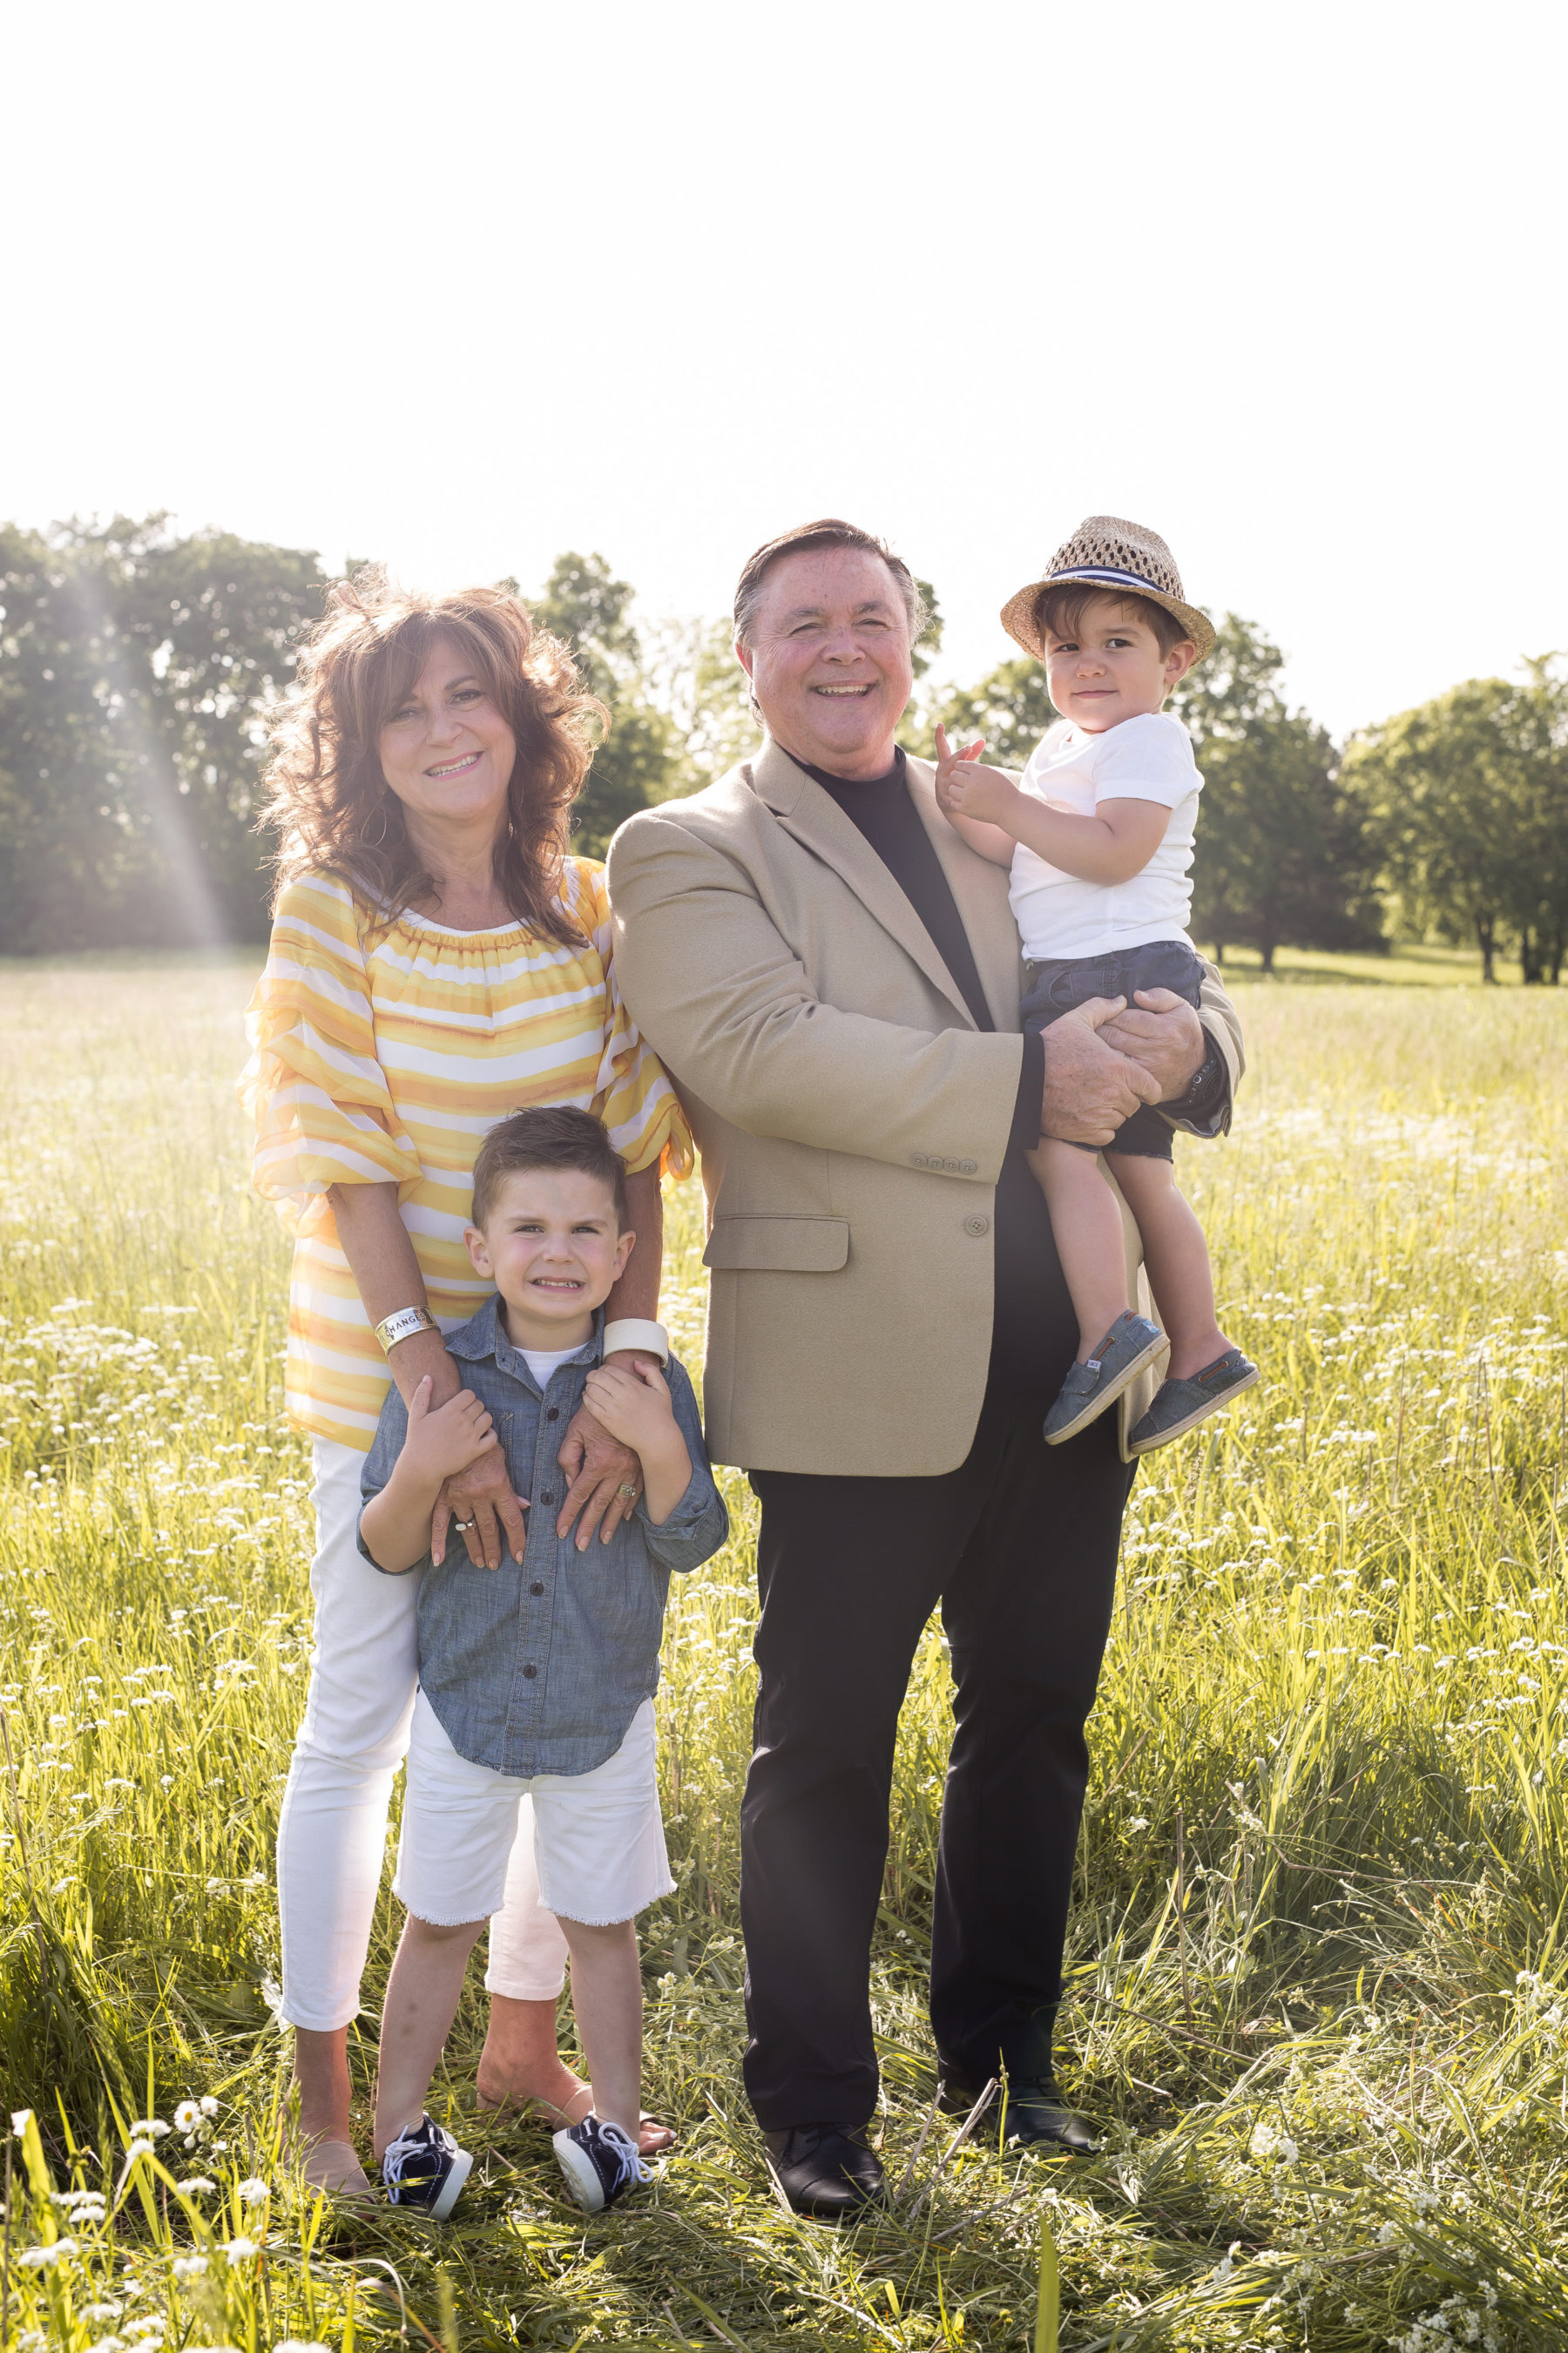 Mini Family Photo Session featured on Nashville Bride Guide